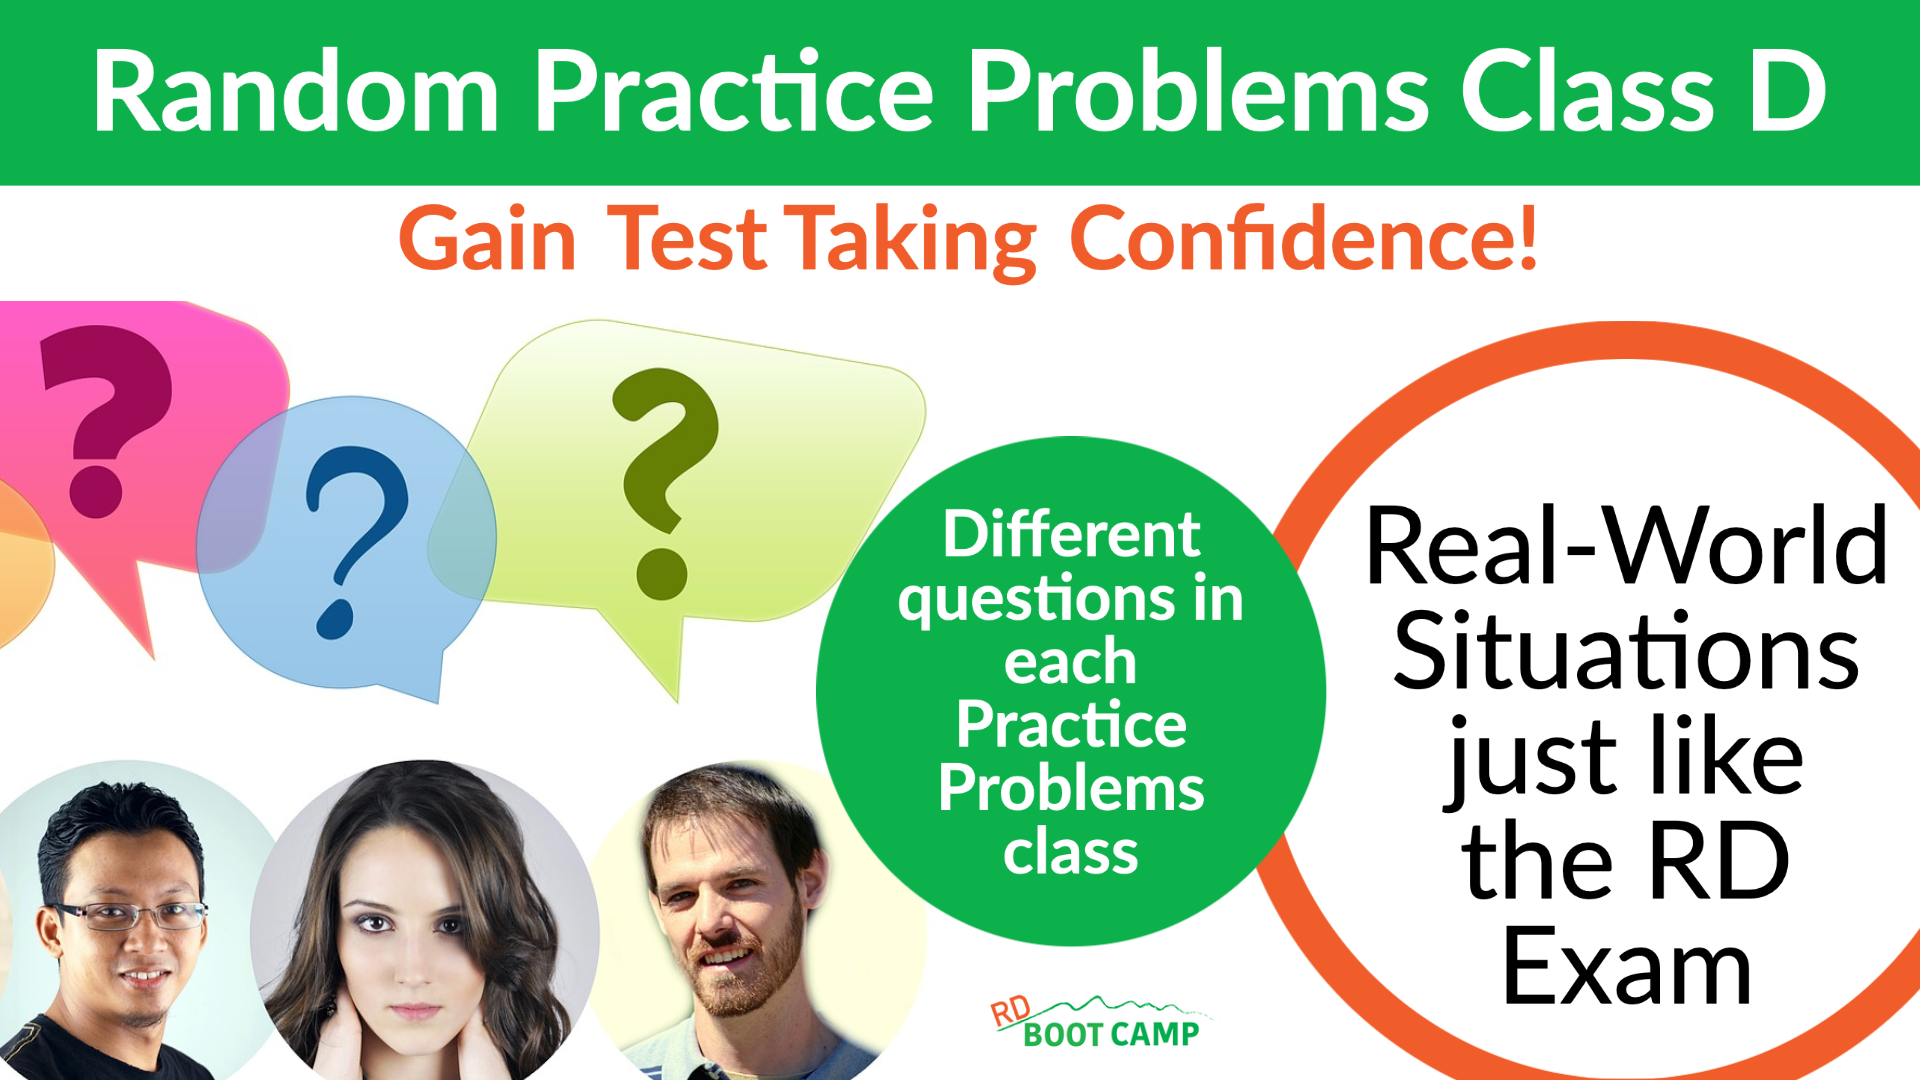 Random Practice Problems D class header